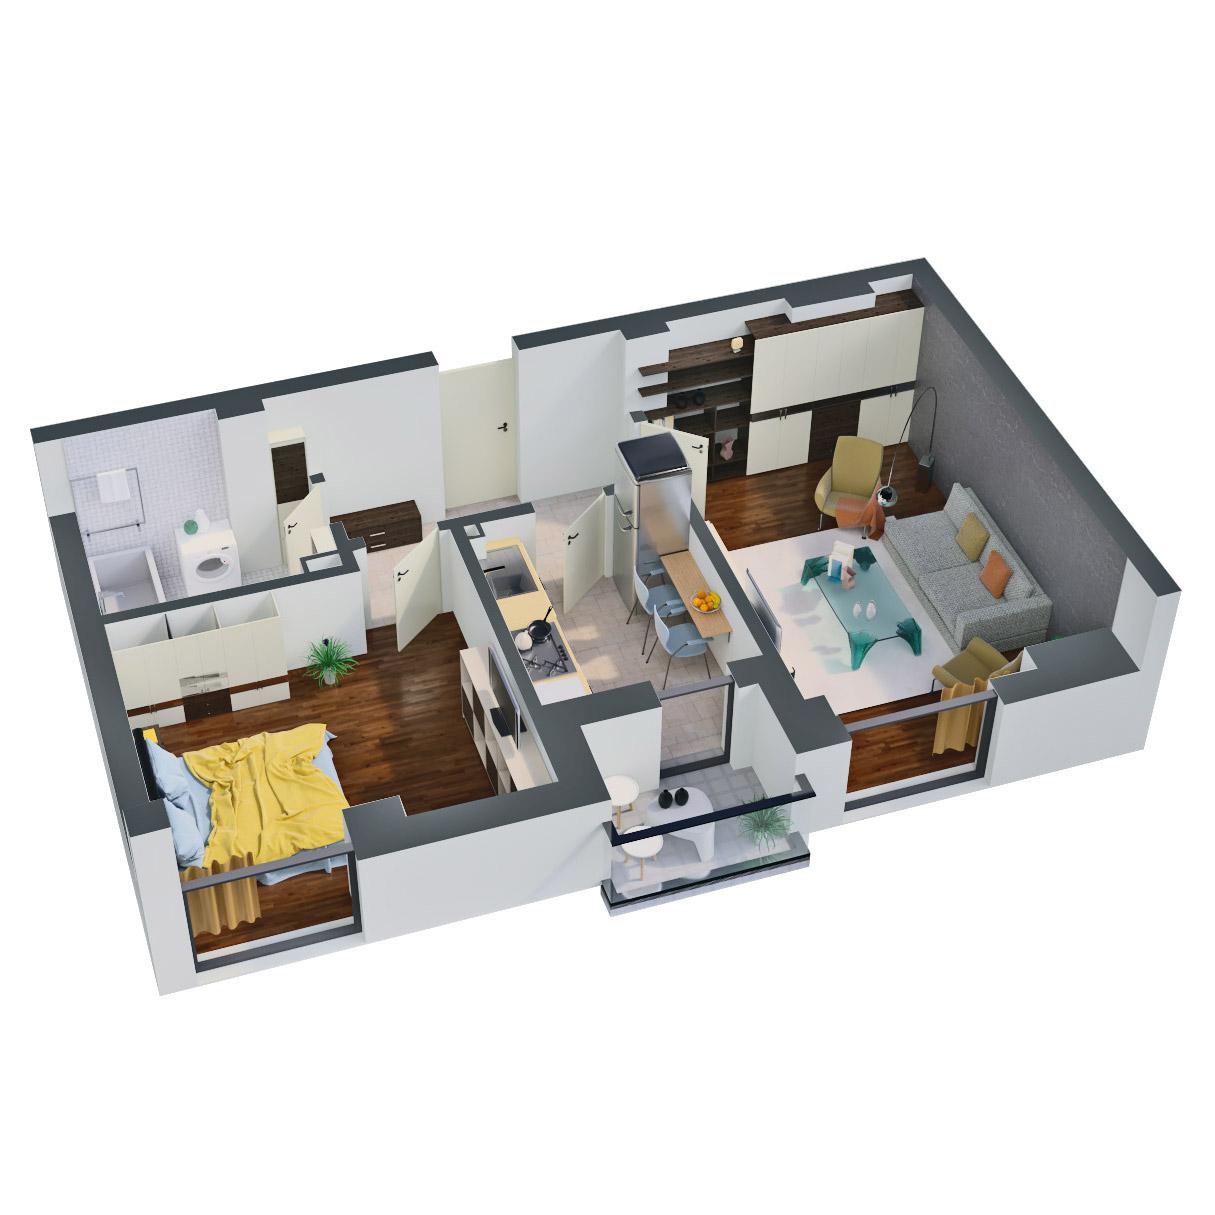 Apartament 2 camere de vanzare Bucuresti - Catedral Residence - Marriott, Piata Unirii, 13 Septembrie, Izvor - Tip 1 - T1 - C